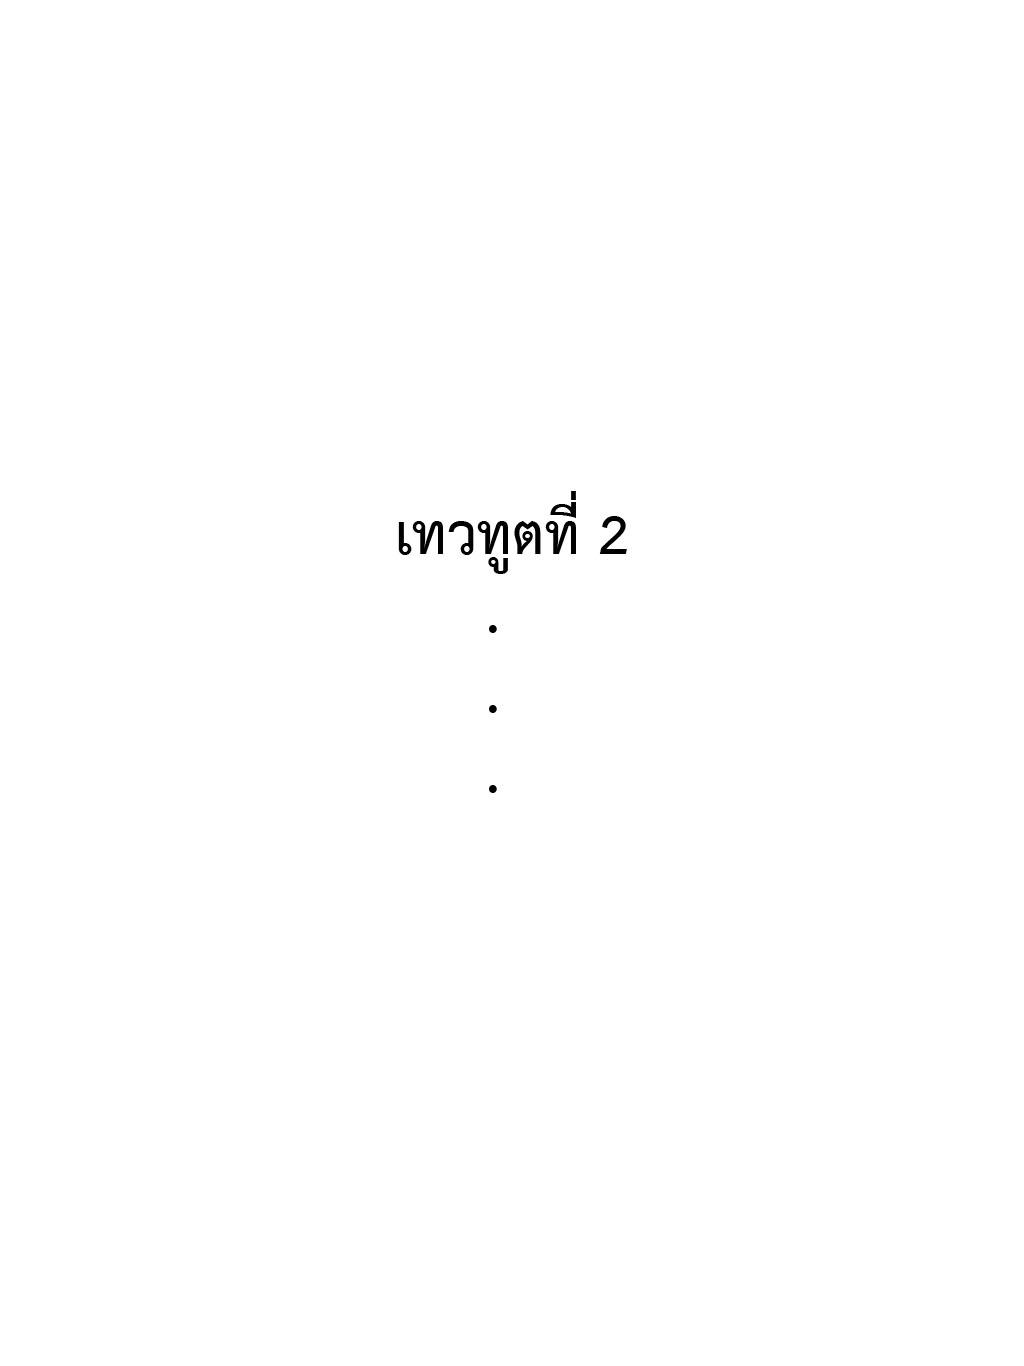 WANTED - เทวทูตที่ 2